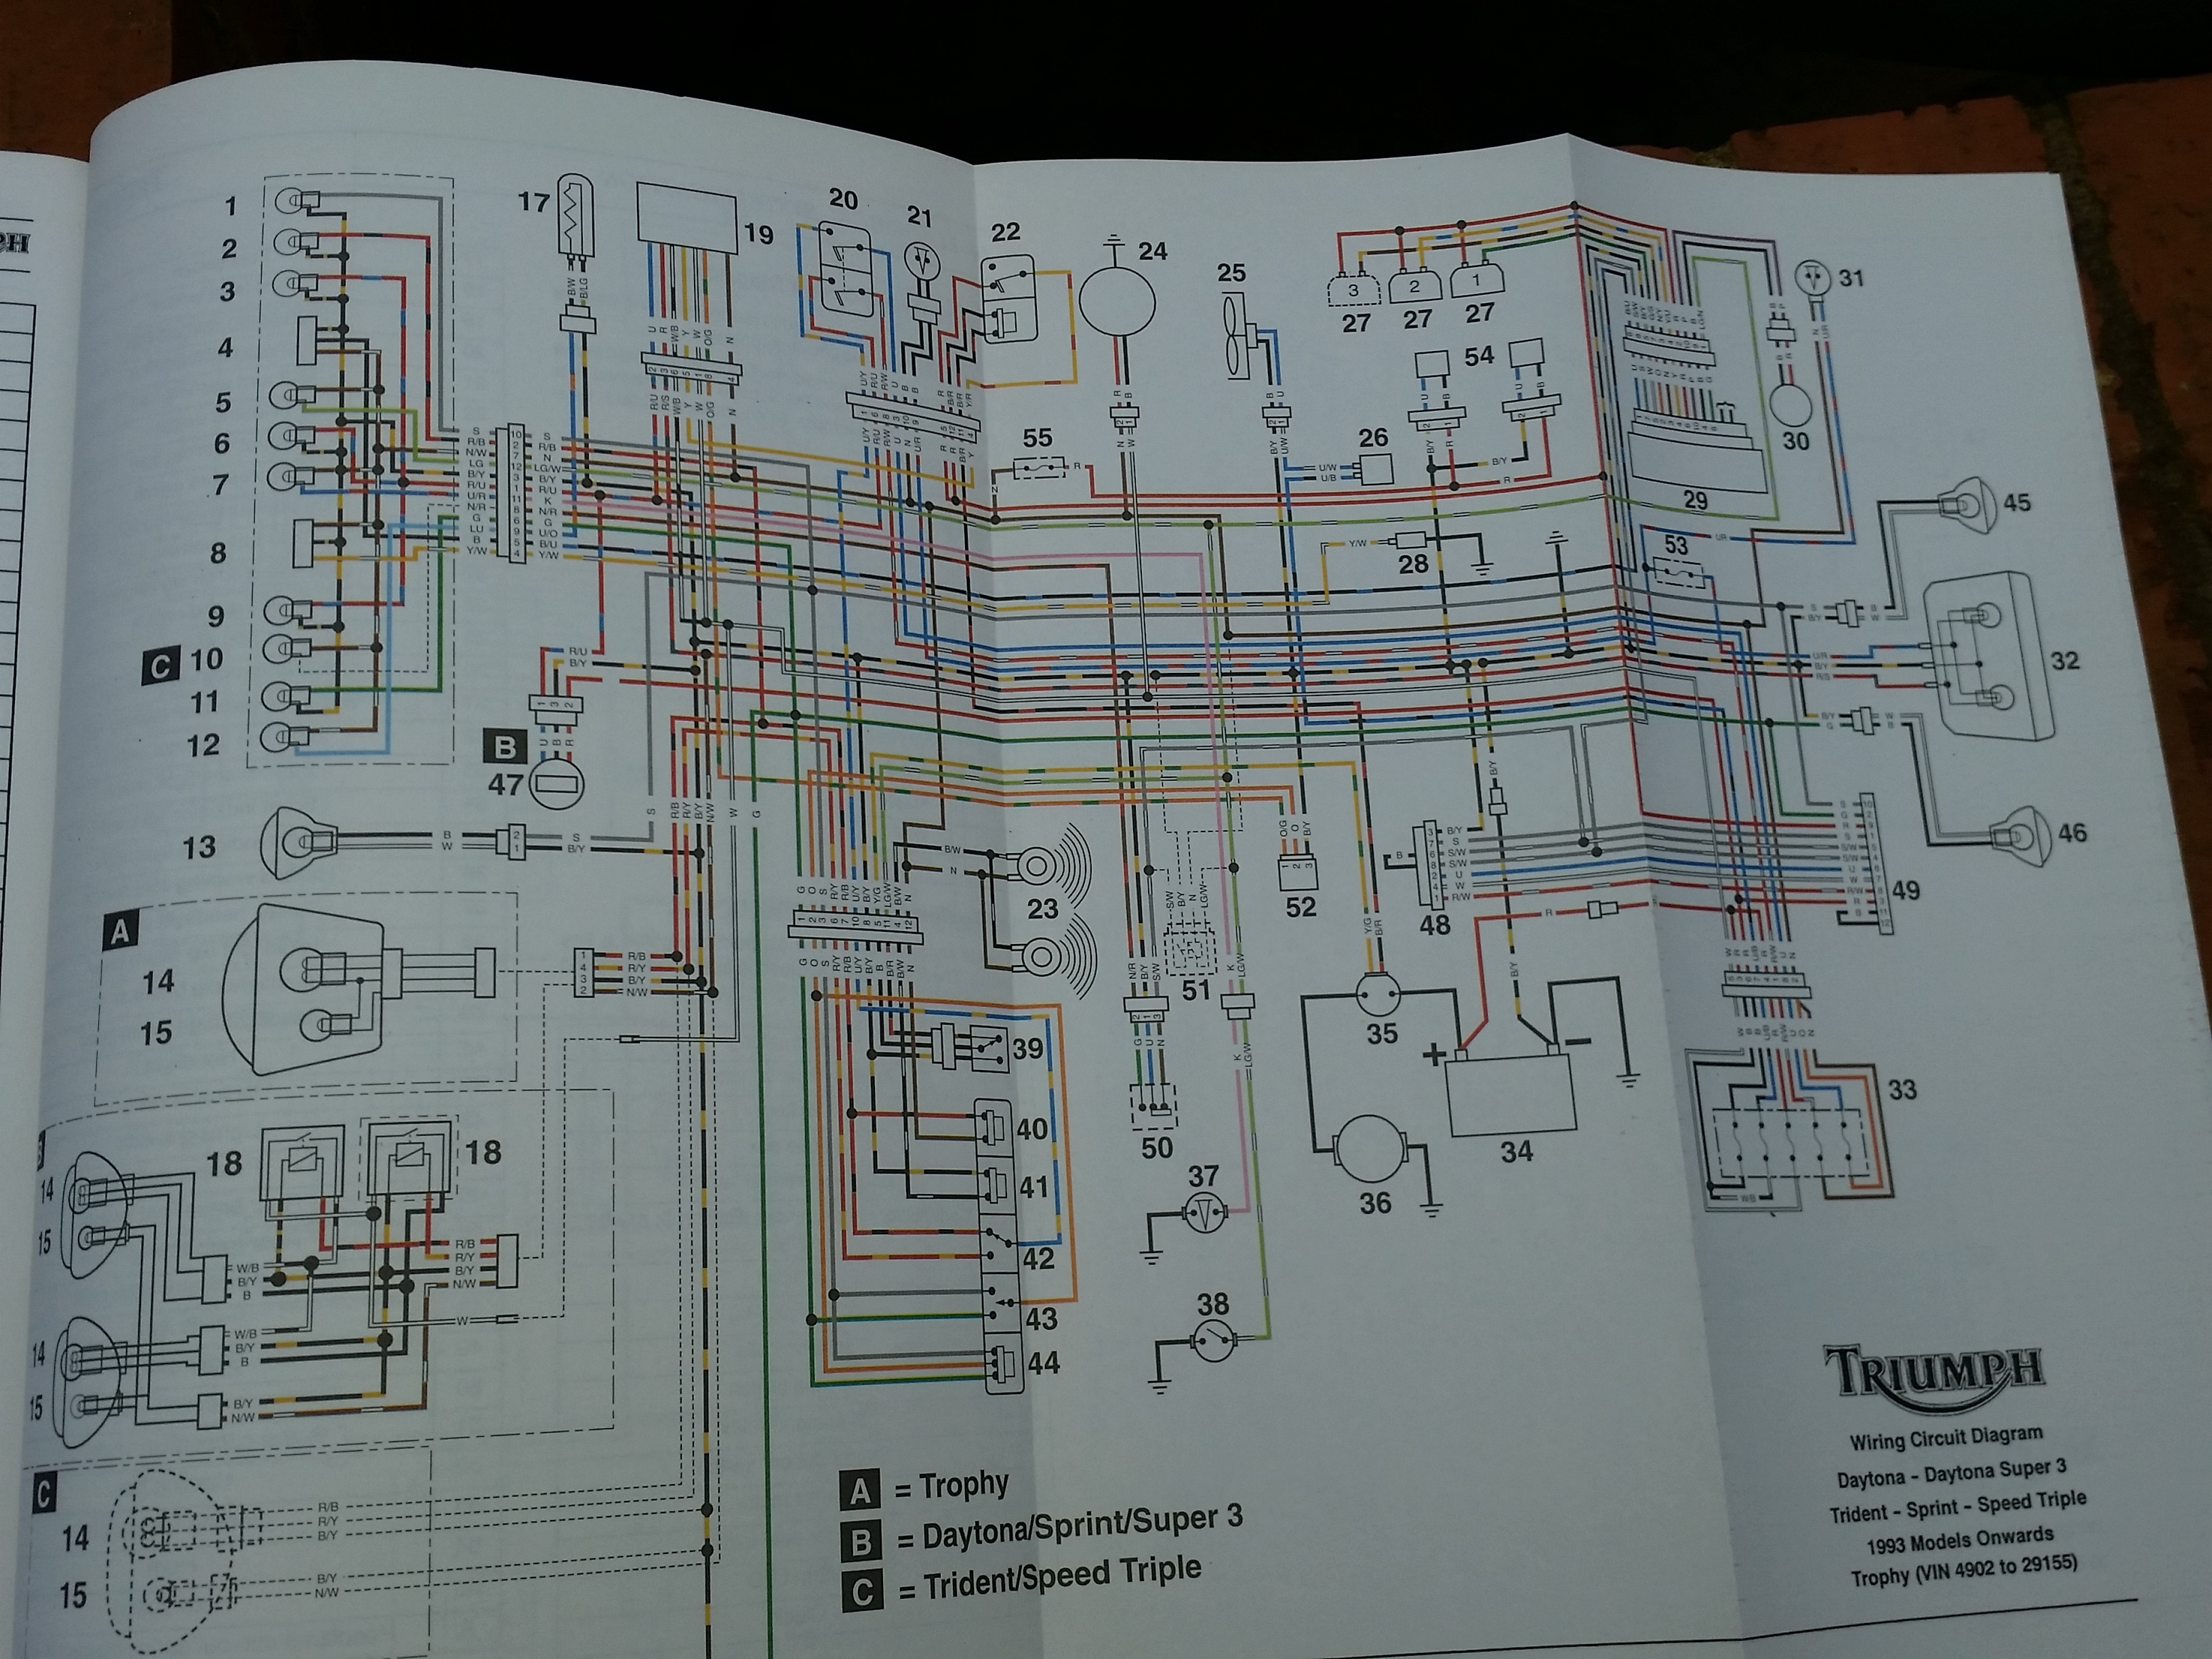 Diagram 1969 Triumph Bonneville Wiring Diagram Full Version Hd Quality Wiring Diagram Torodiagram Cabinet Accordance Fr